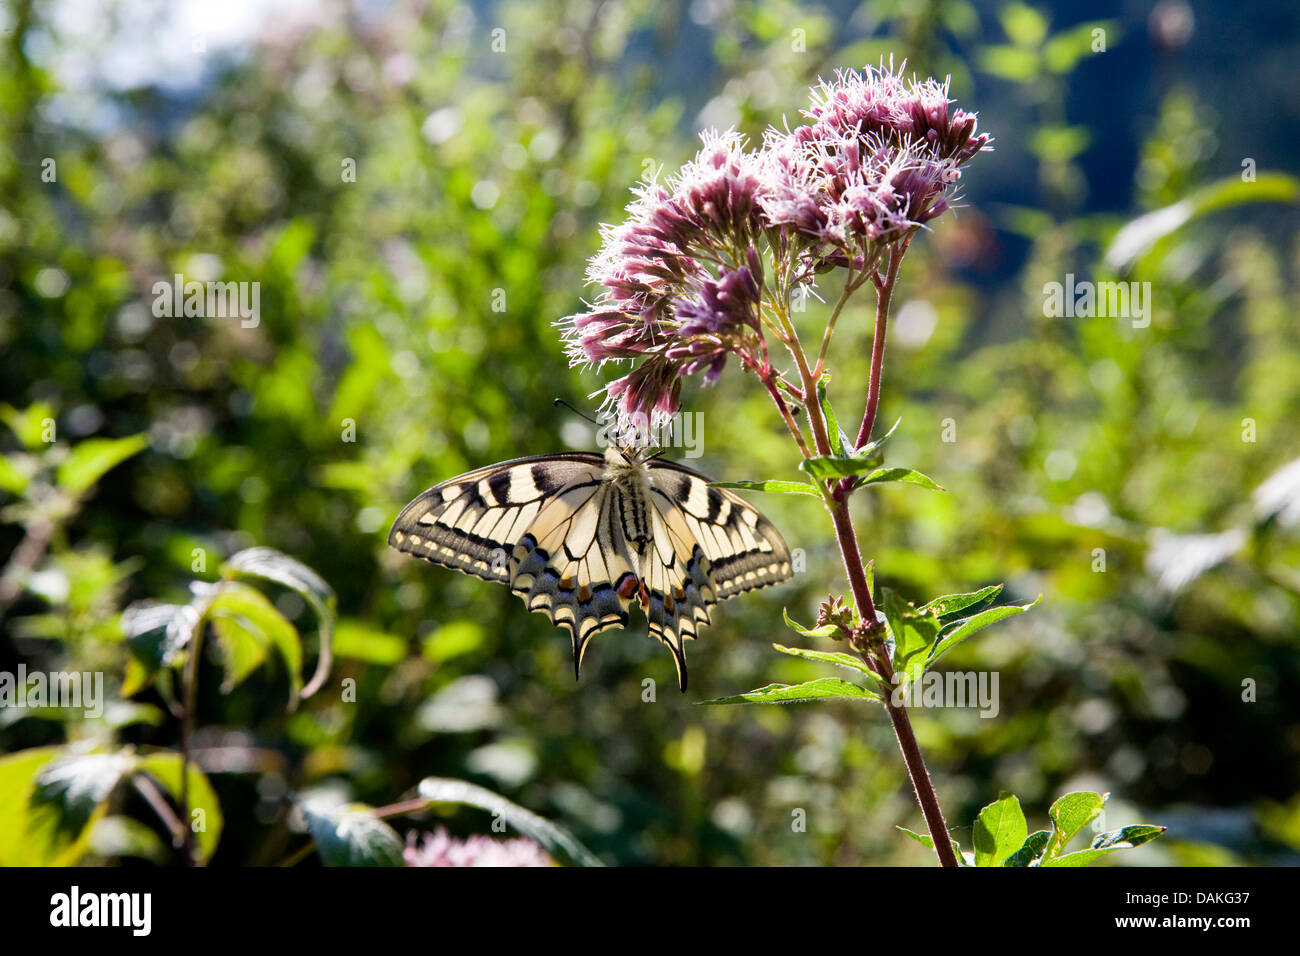 swallowtail (Papilio machaon), sucking nectar at swallowtail, Eupatorium cannabinum, Germany - Stock Image